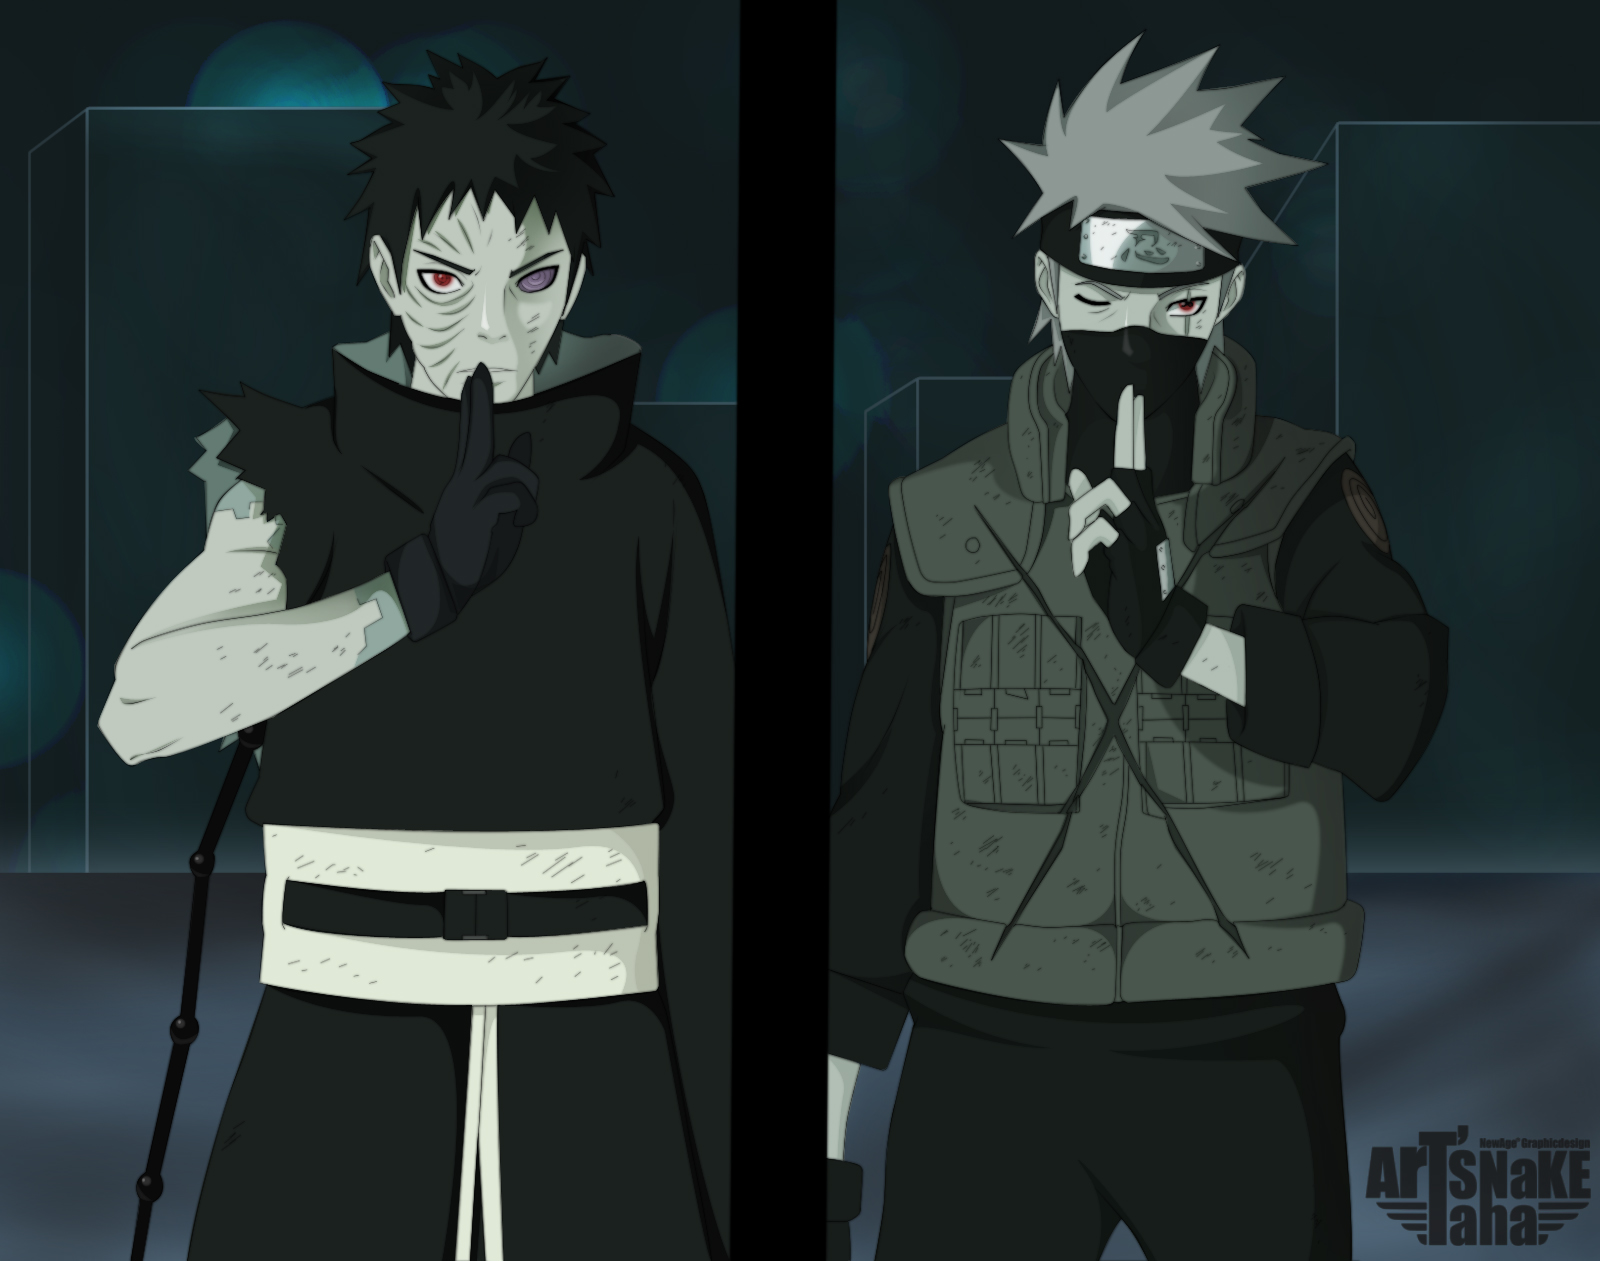 obito uchiha hình nền titled Obito Ichiha and Kakashi Hatake